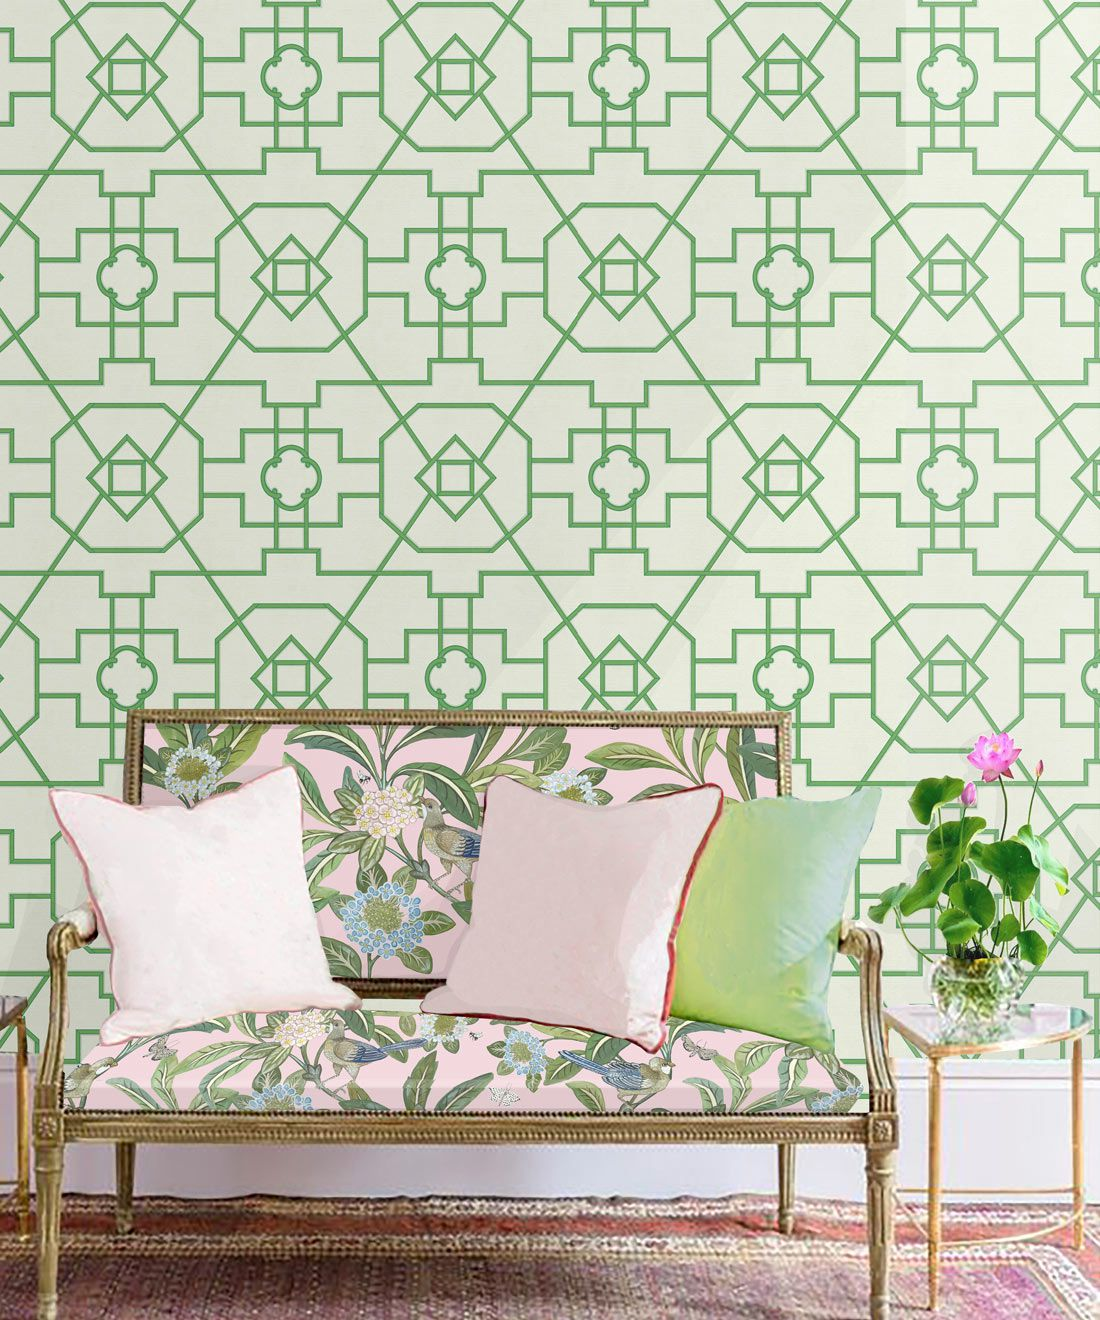 Trellis Wallpaper • Geometric Wallpaper • Ivory Wallpaper • Insitu behind a sofa